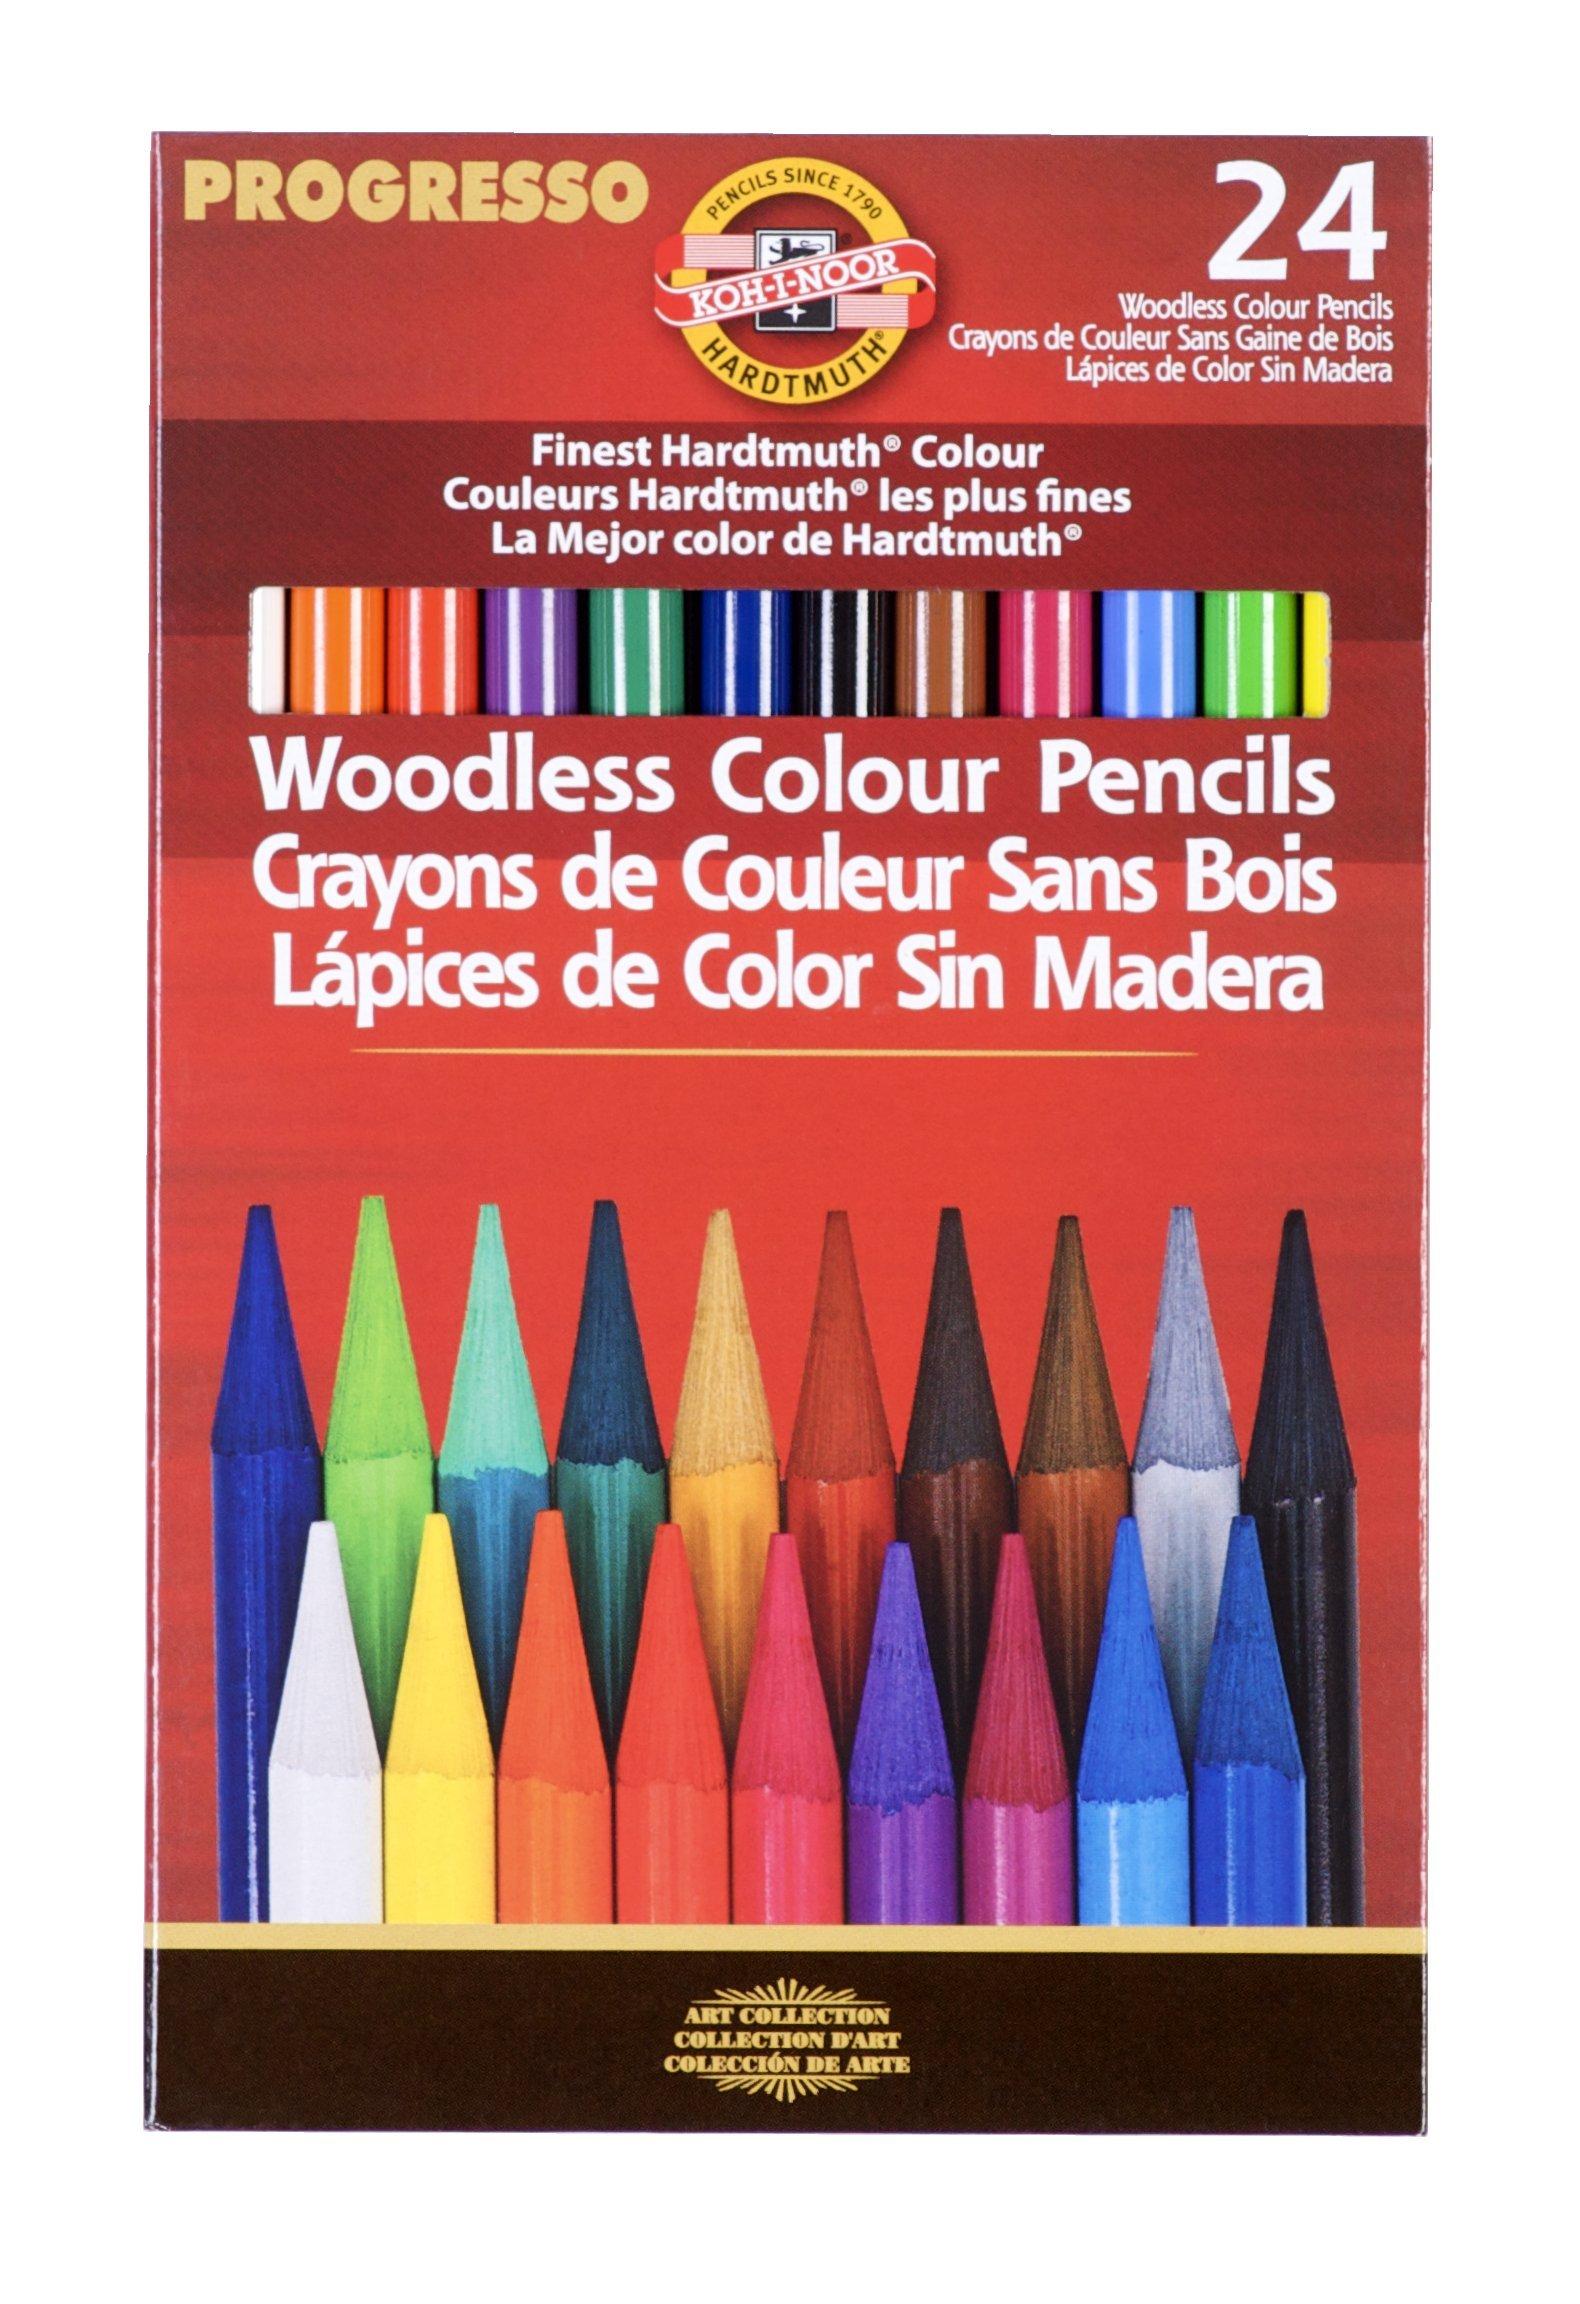 Koh-I-Noor Progresso Woodless Colored 24-Pencil Set, Assorted Colored Pencils (FA8758.24)